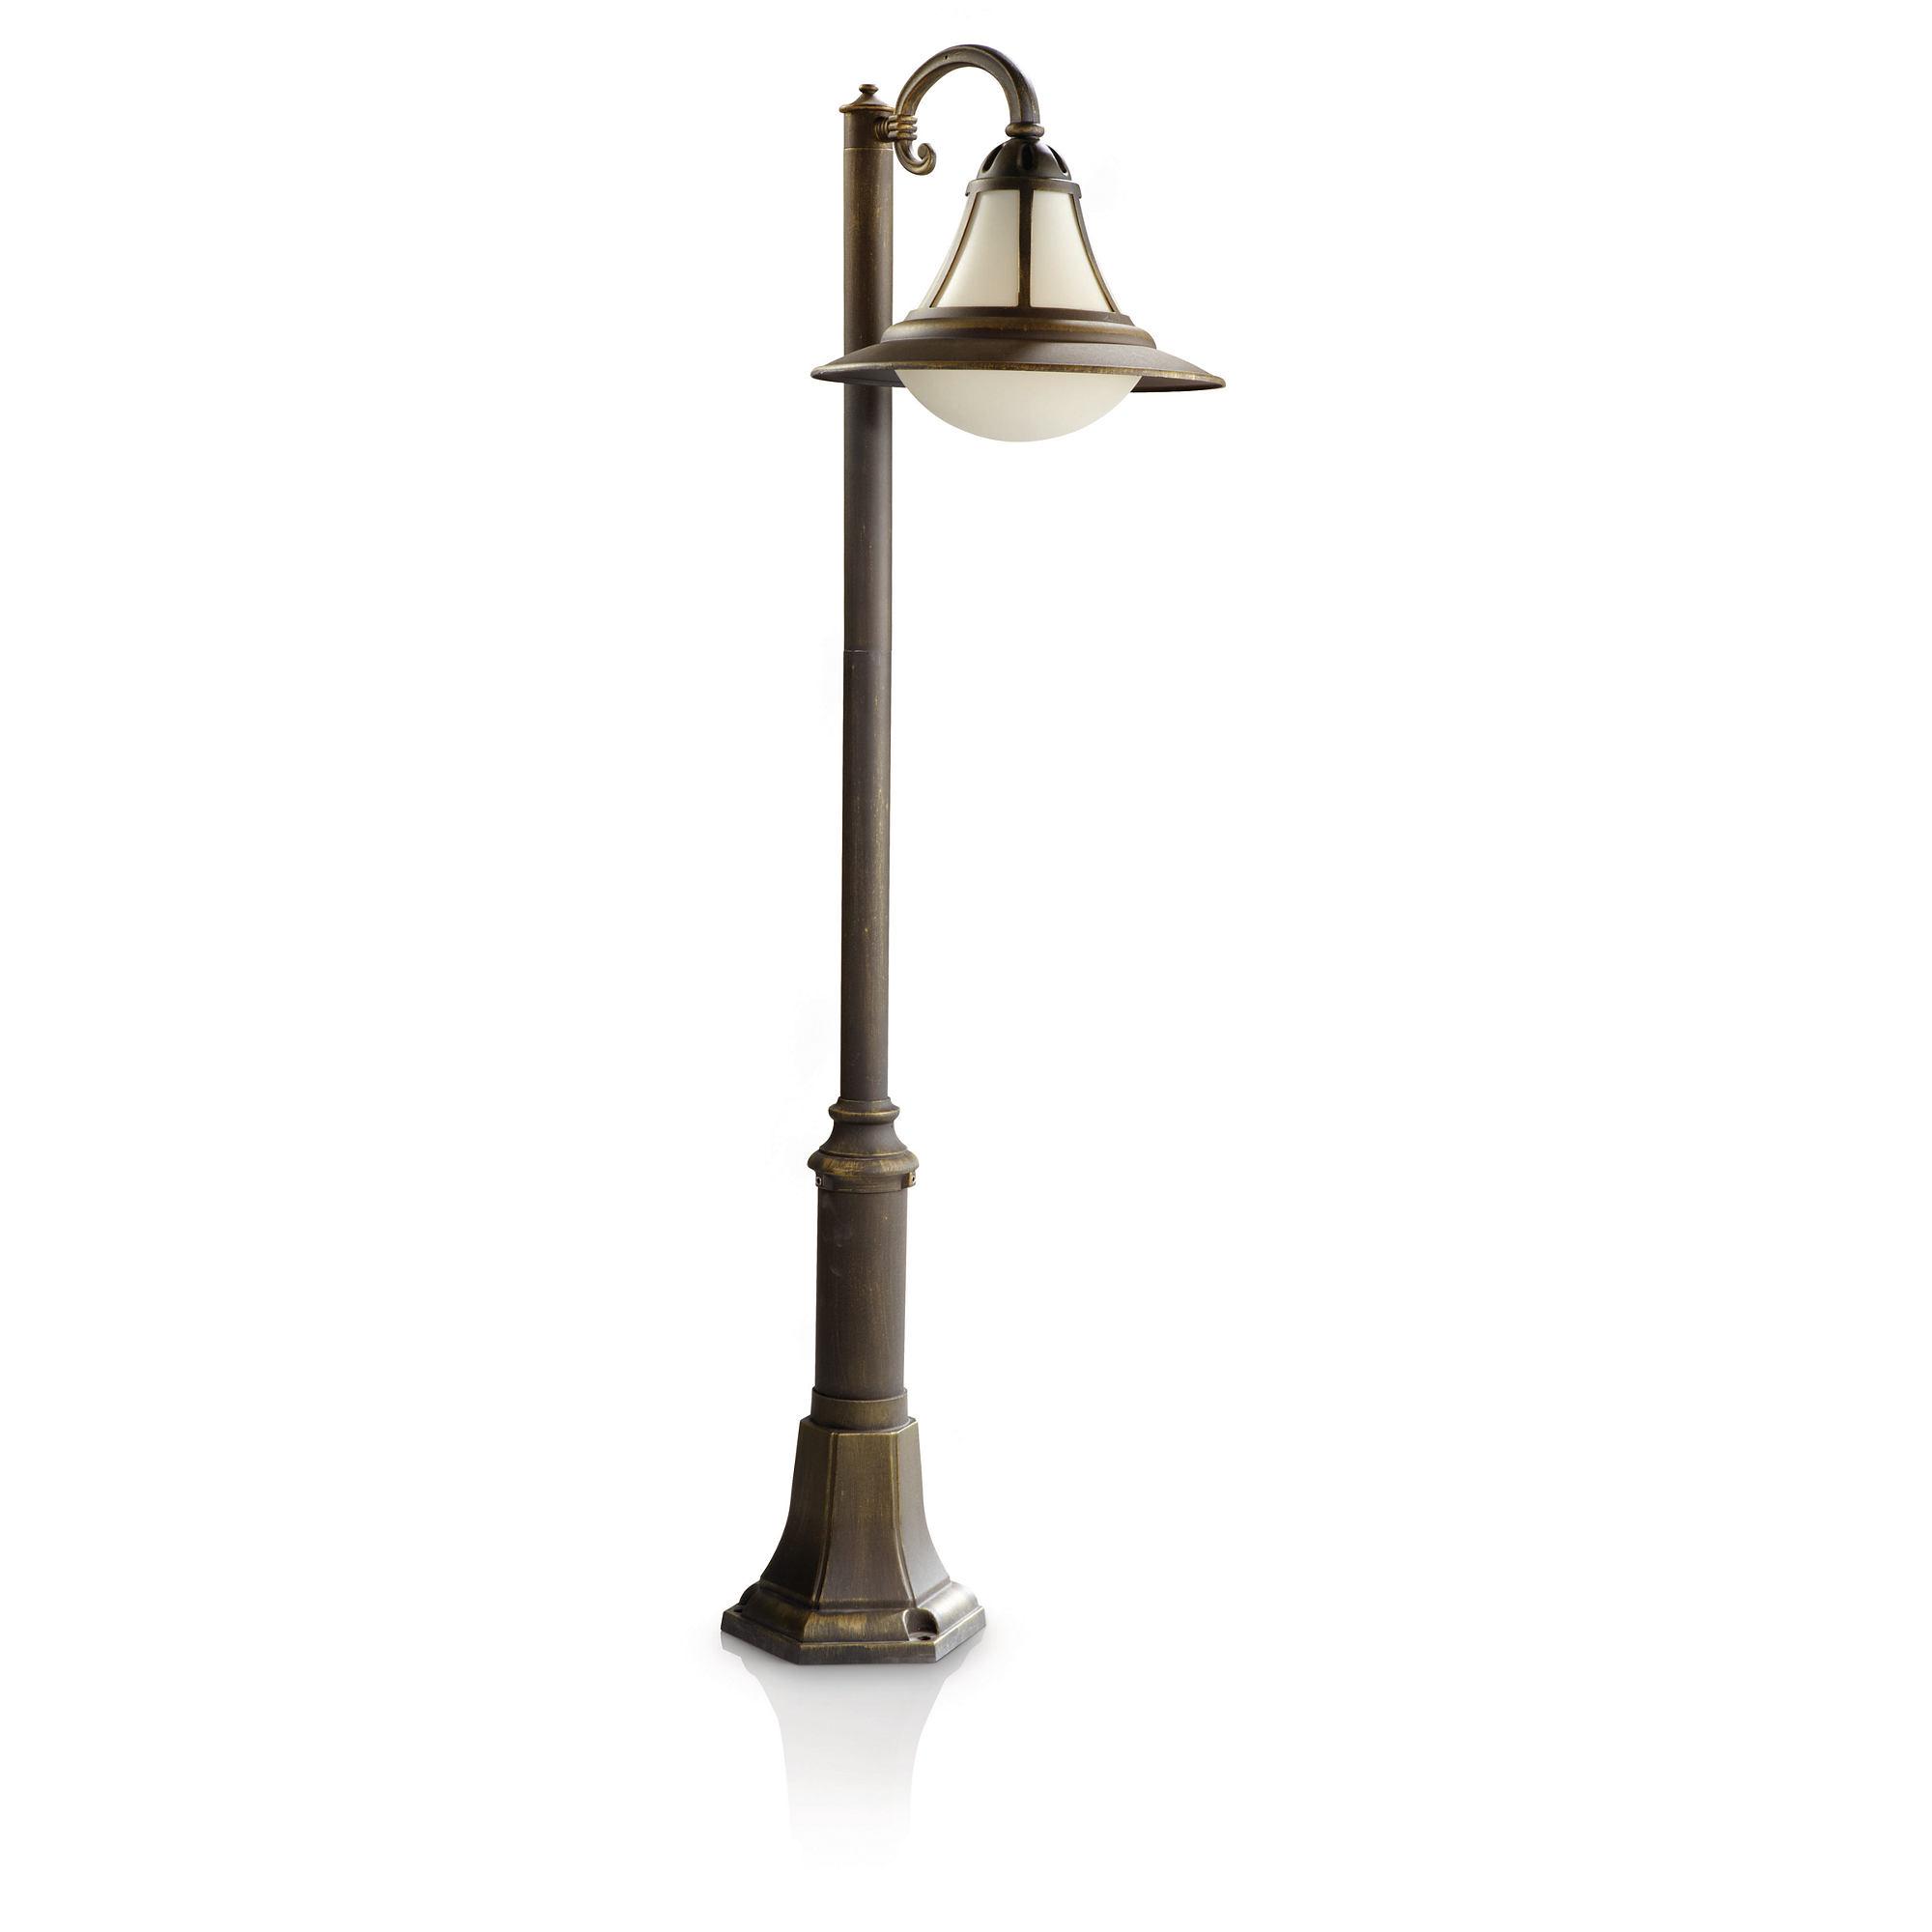 Provence Mygarden Floor Lamp By Philips